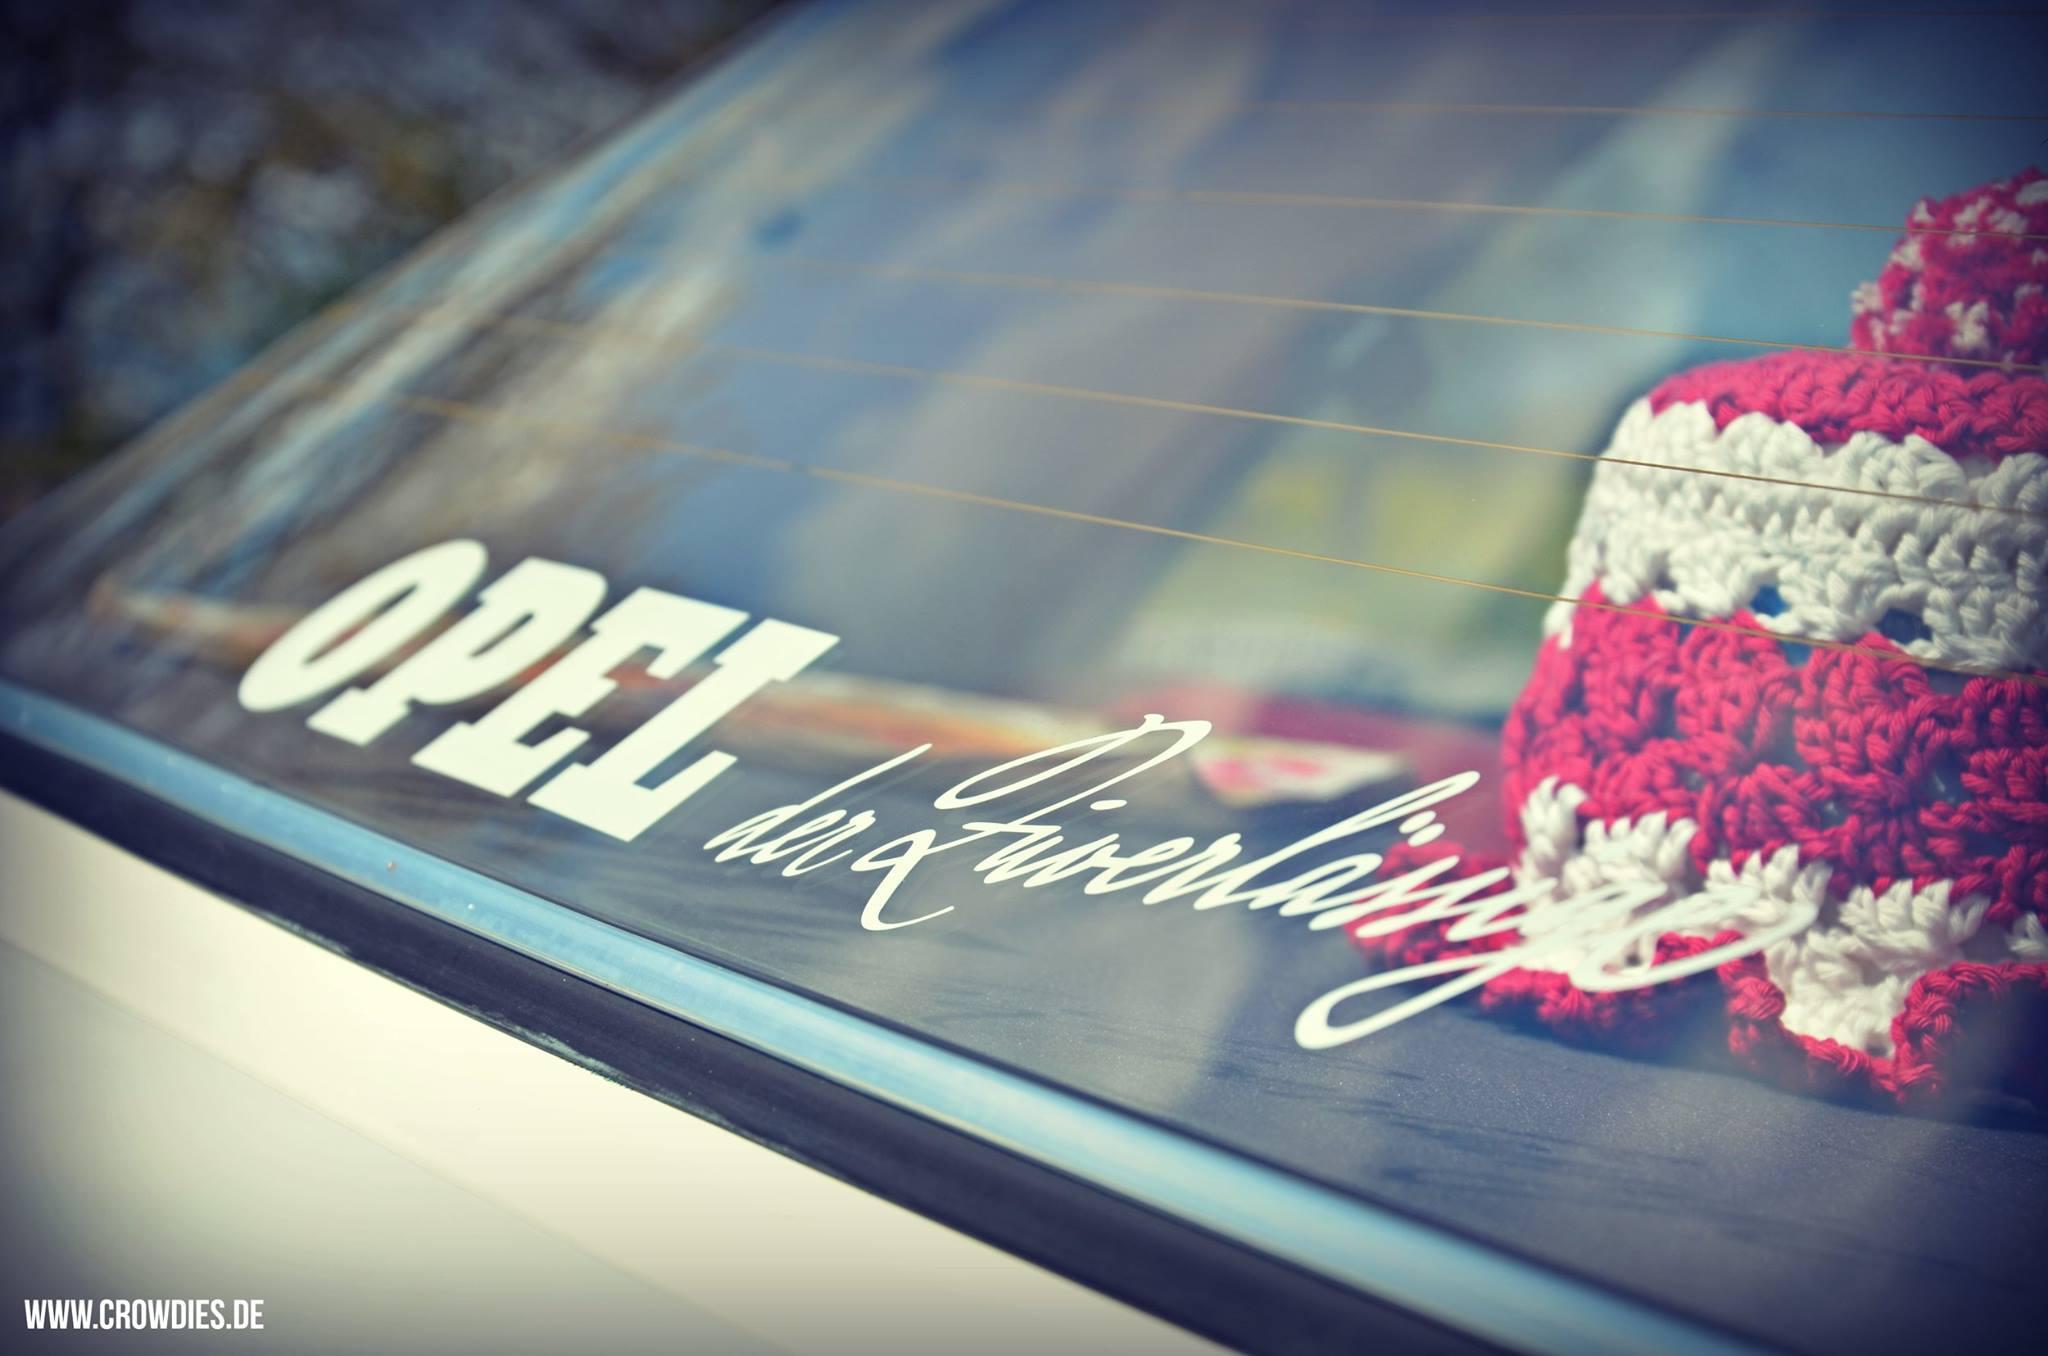 Daniel's Opel Ascona